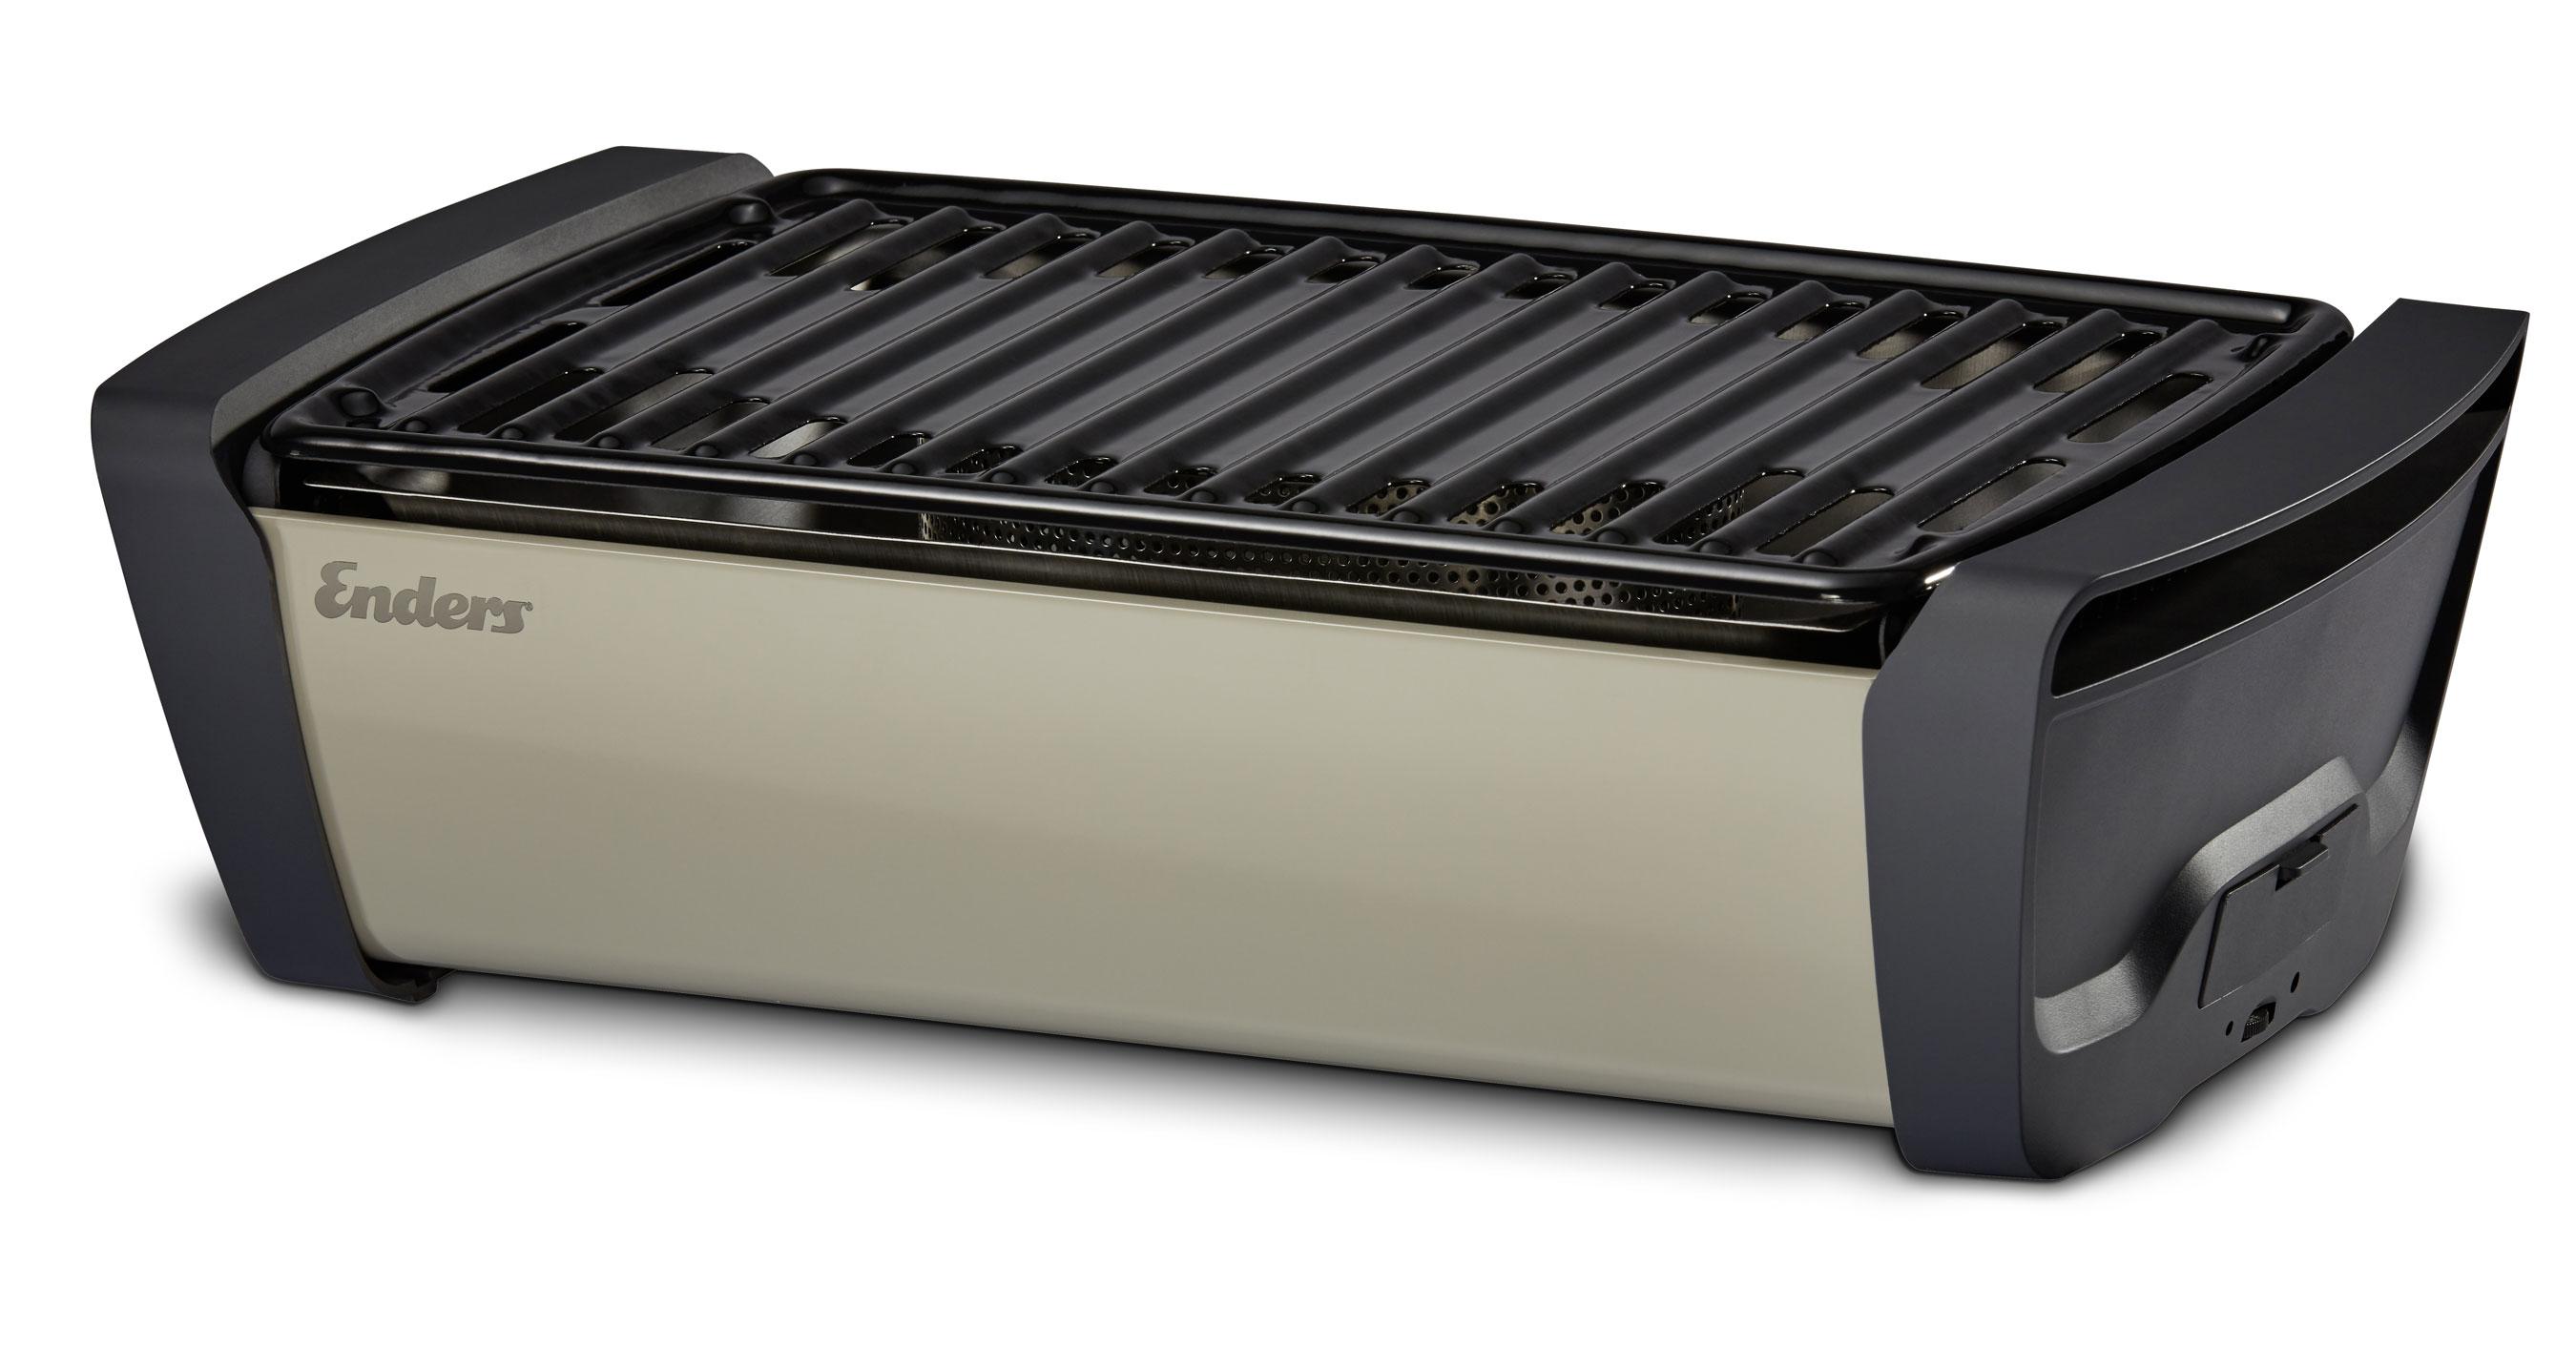 Enders Gasgrill : Enders raucharmer grill tischgrill aurora taupe grillfläche